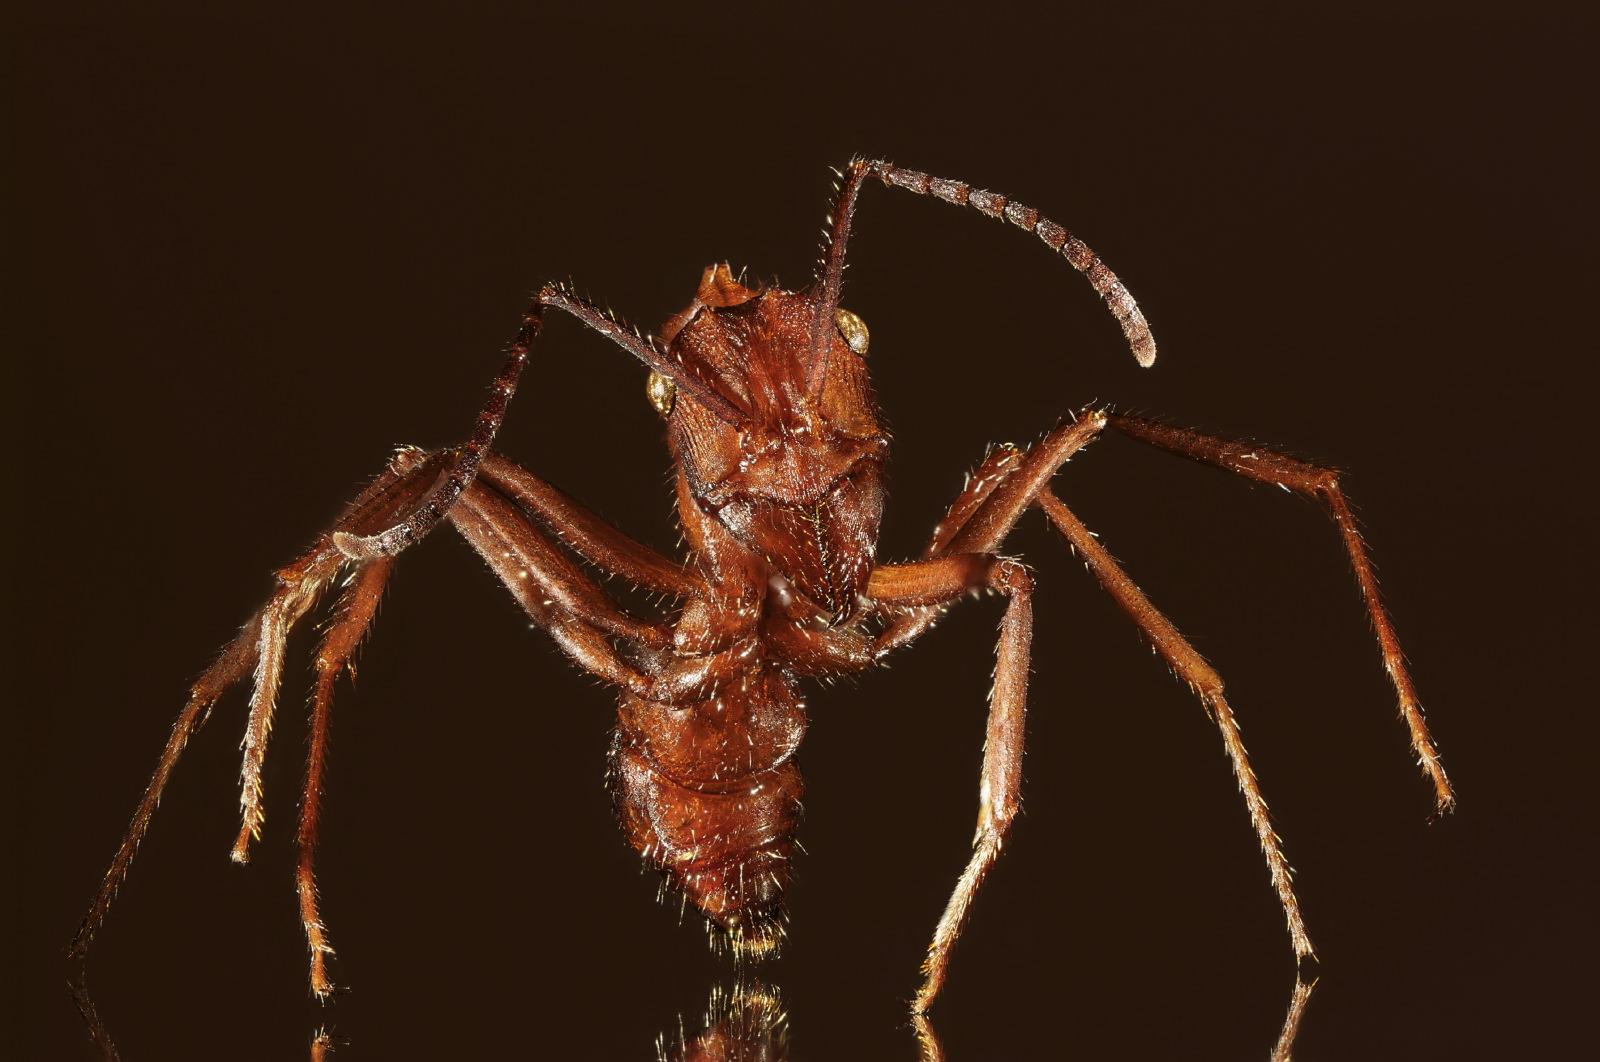 Ectatomma ant full body